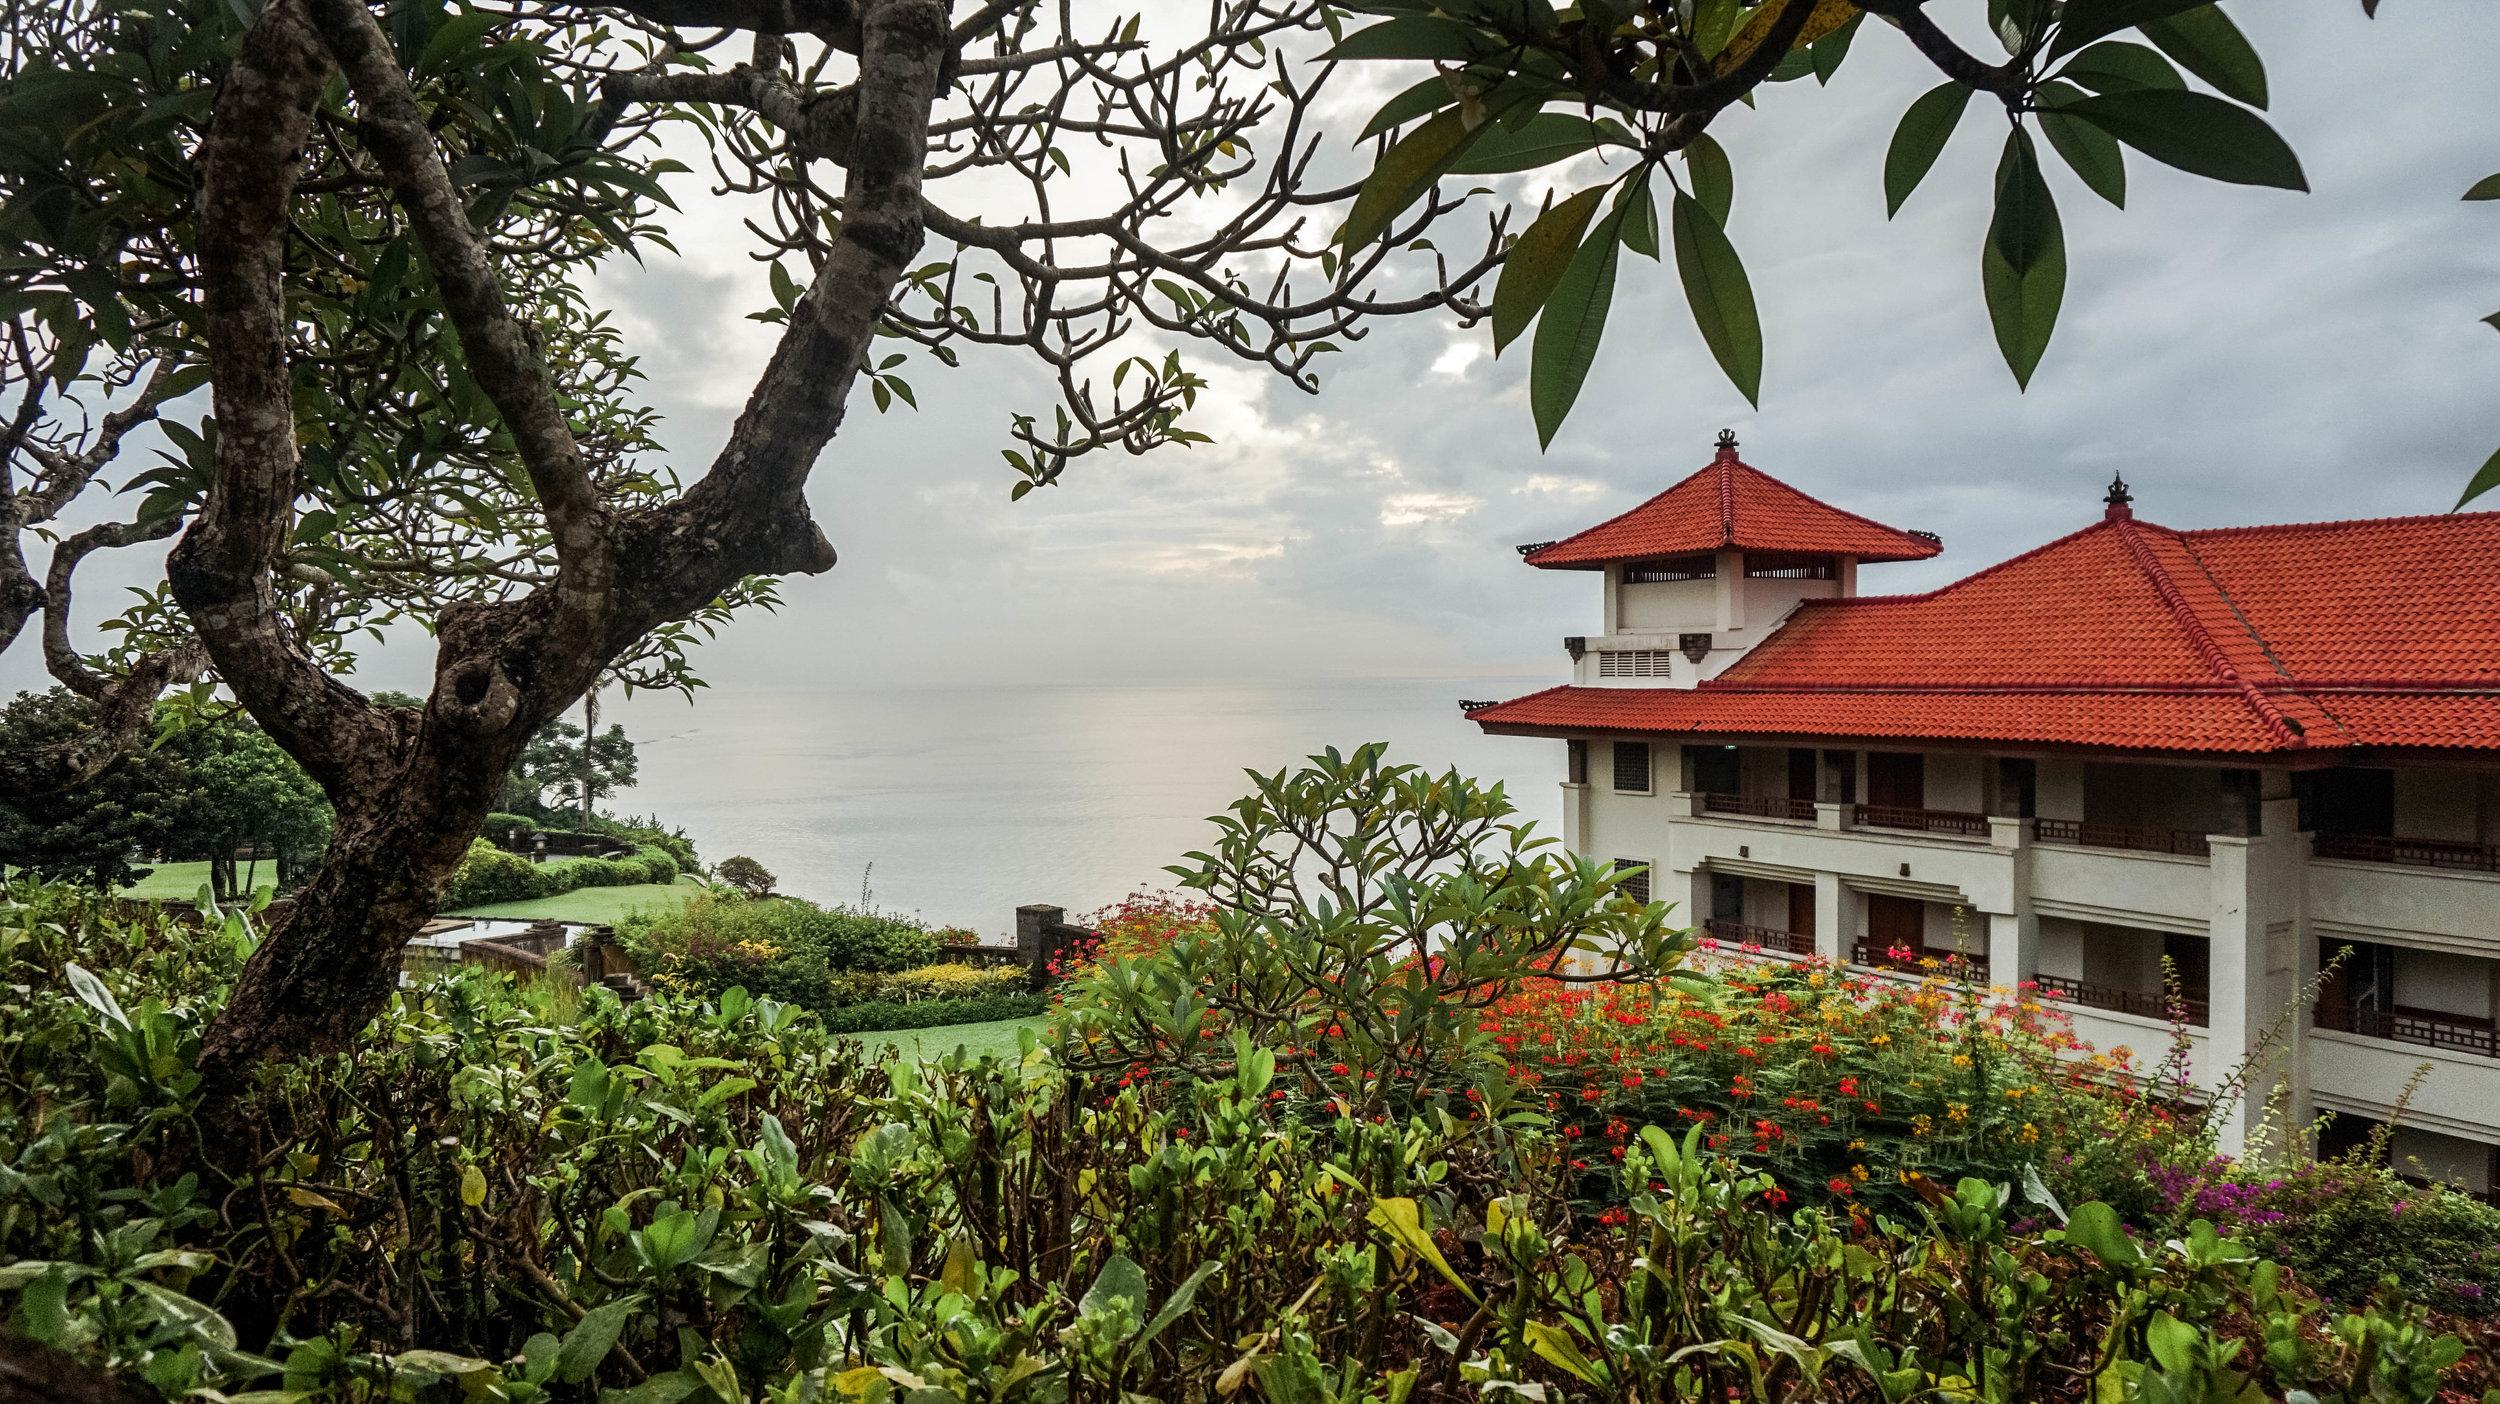 Hilton-bali-resort-clifftop.jpg